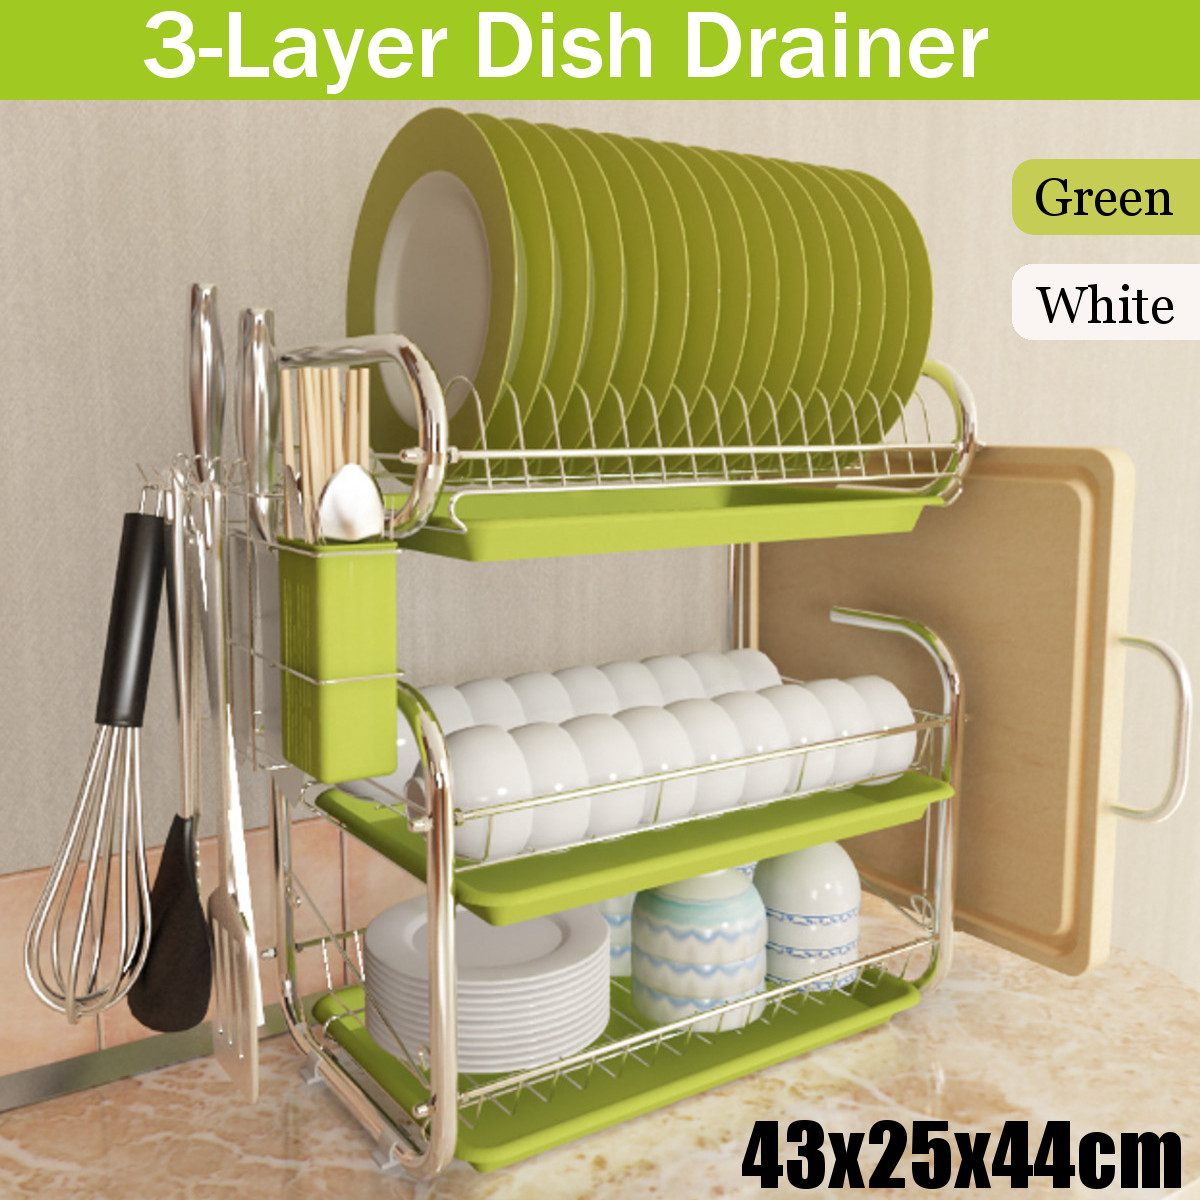 3 niveles estante de secado de platos estante para almacenaje de cocina soporte de lavado cesta de hierro plateado fregadero de cuchillo escurridor organizador de secado